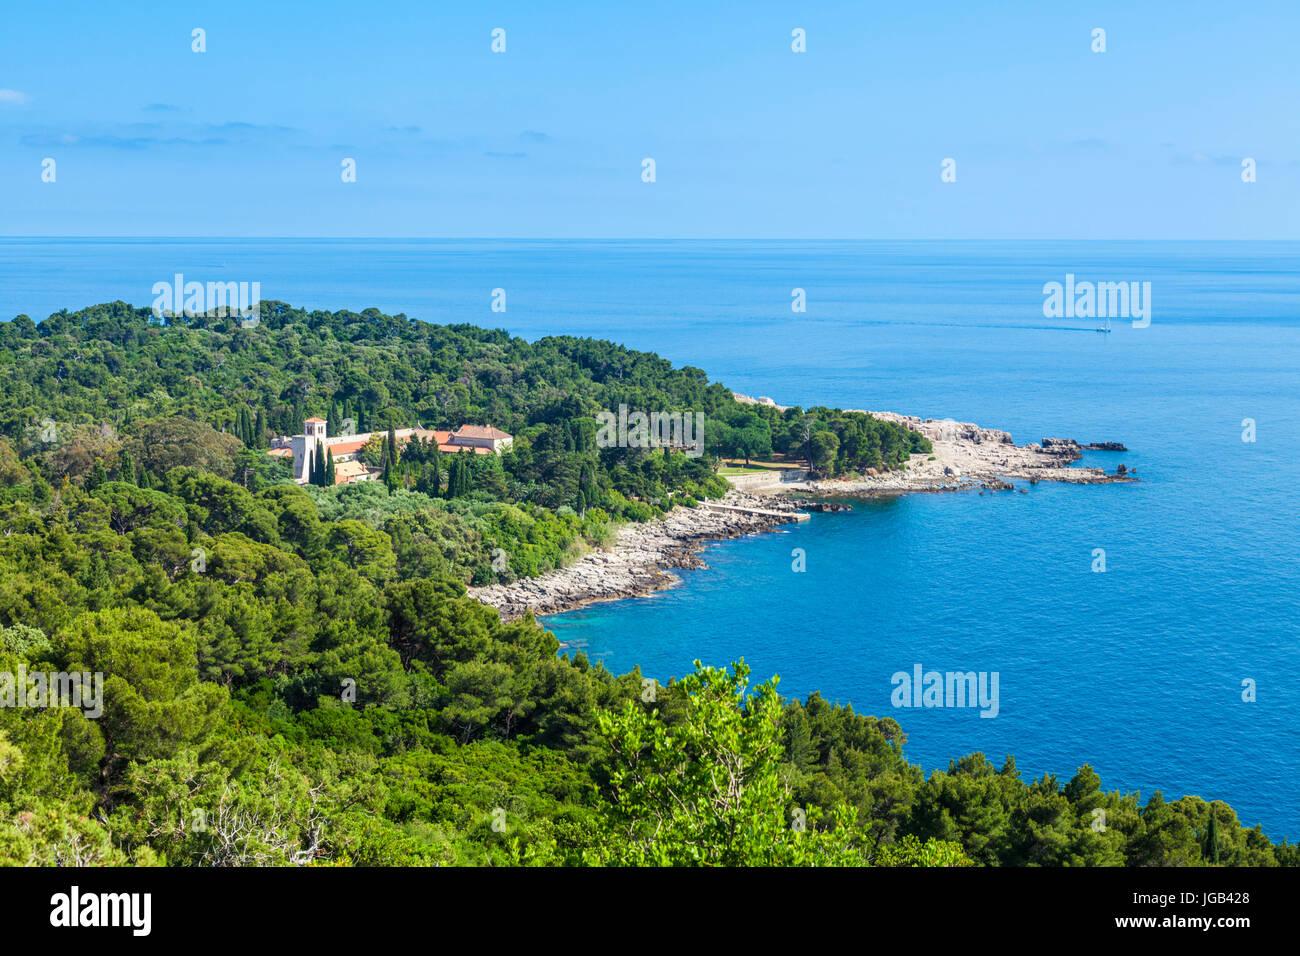 Croatia Dubrovnik Croatia Dalmatian coast aerial view of  Lokrum island Dubrovnik Benedictine Monastery Of St Mary - Stock Image